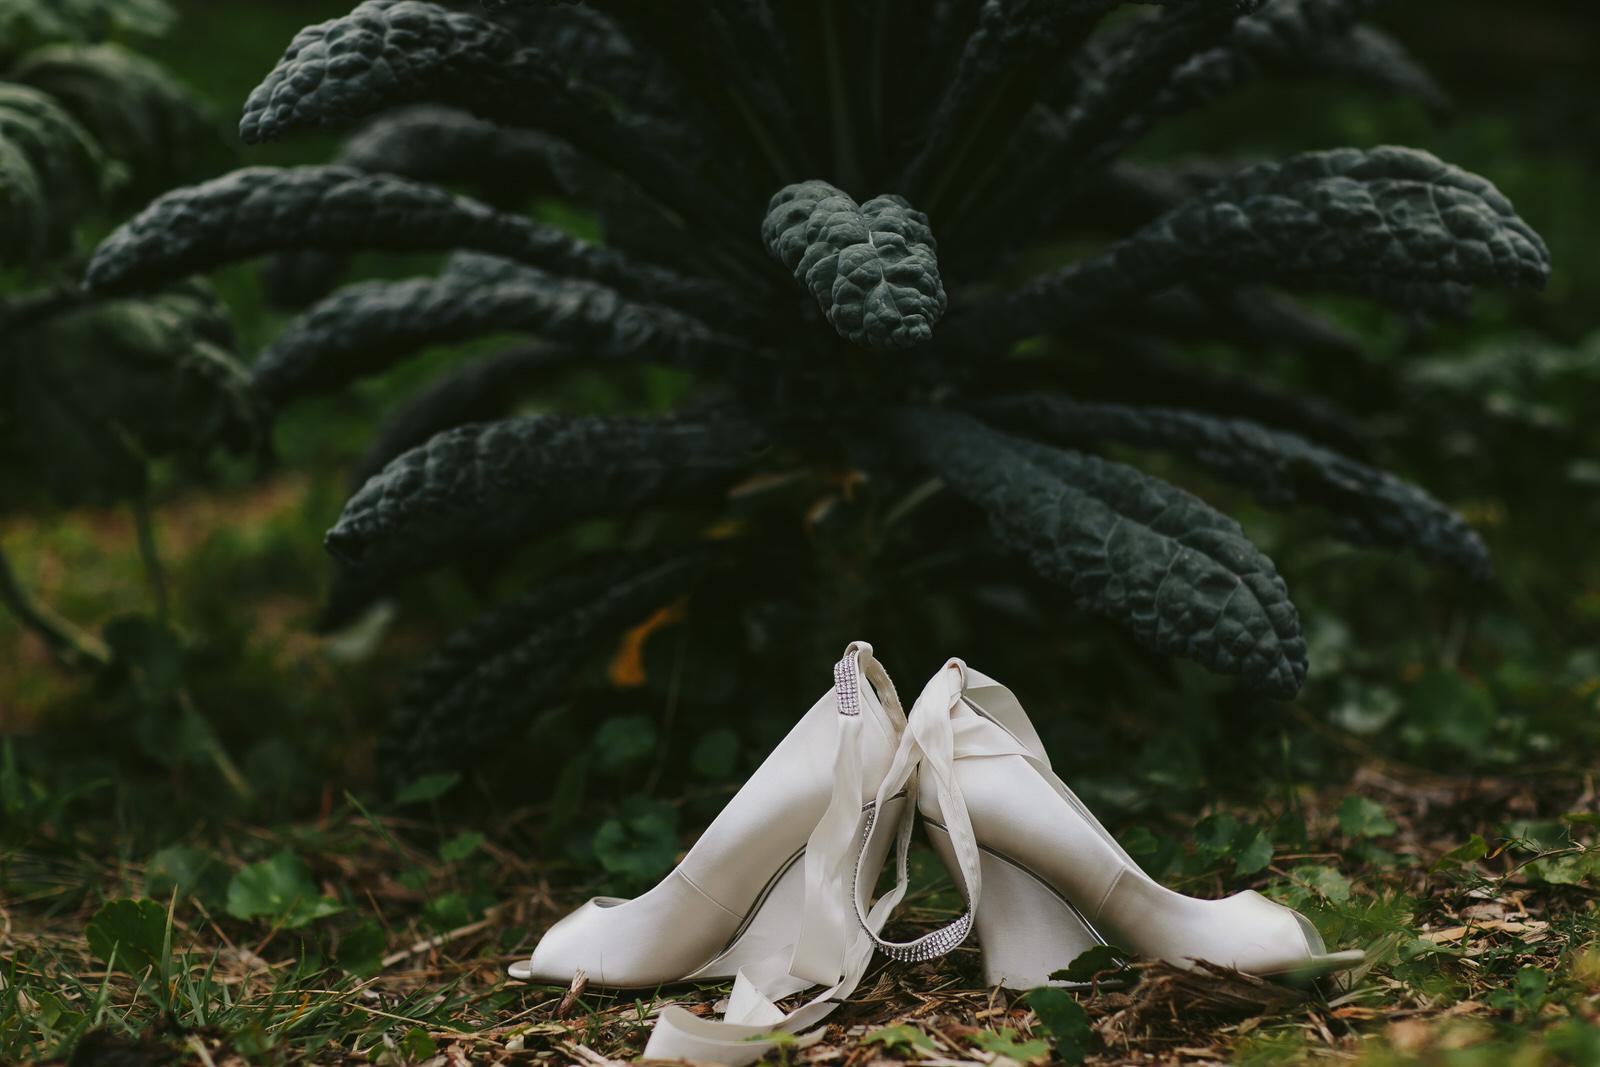 wedding-details-brides-shoes-kale-garden-kashi-ashram-wedding.jpg